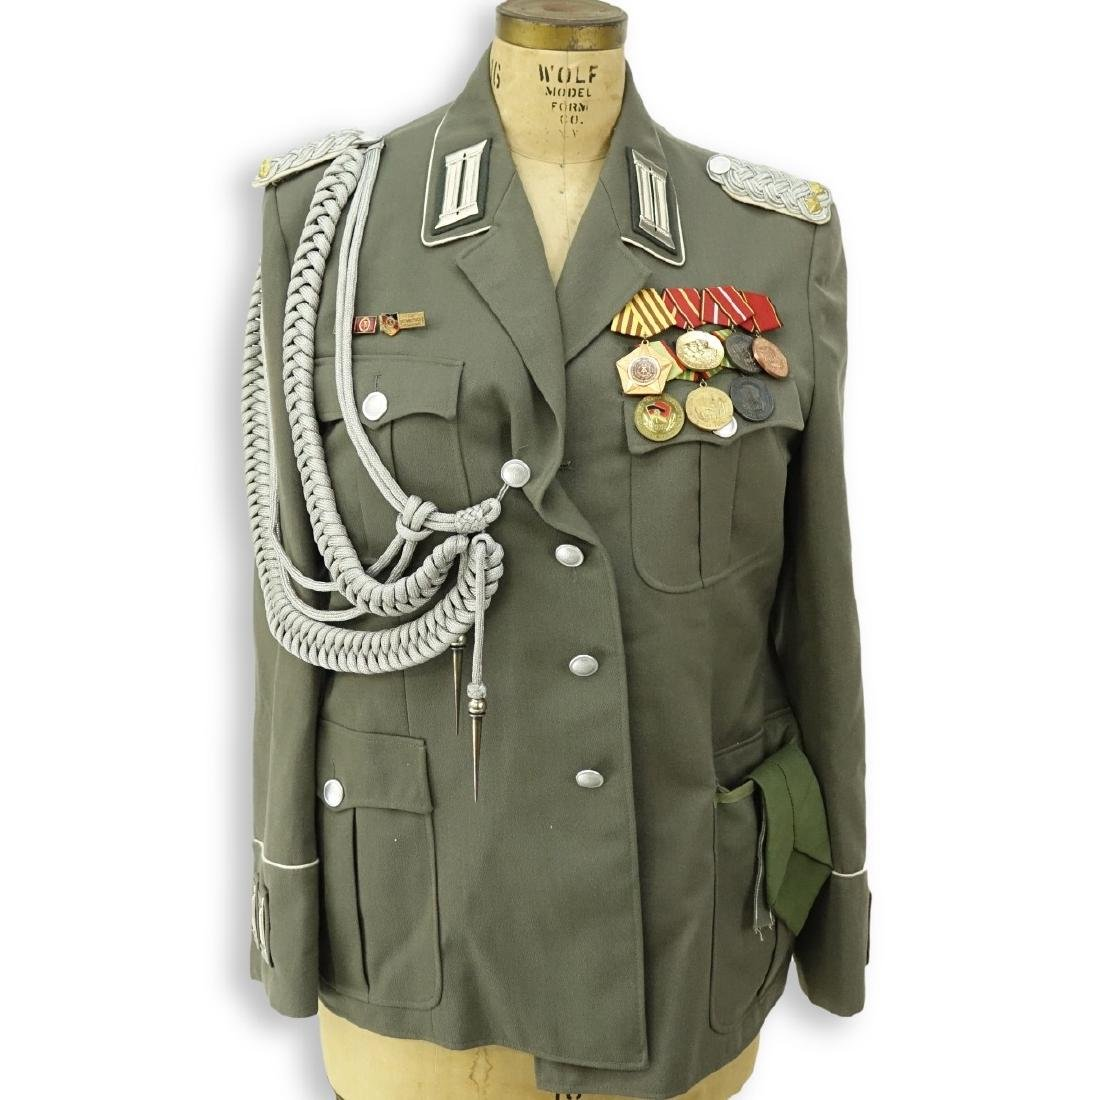 Russian Soviet Era Military Uniform Set With Metal - 2